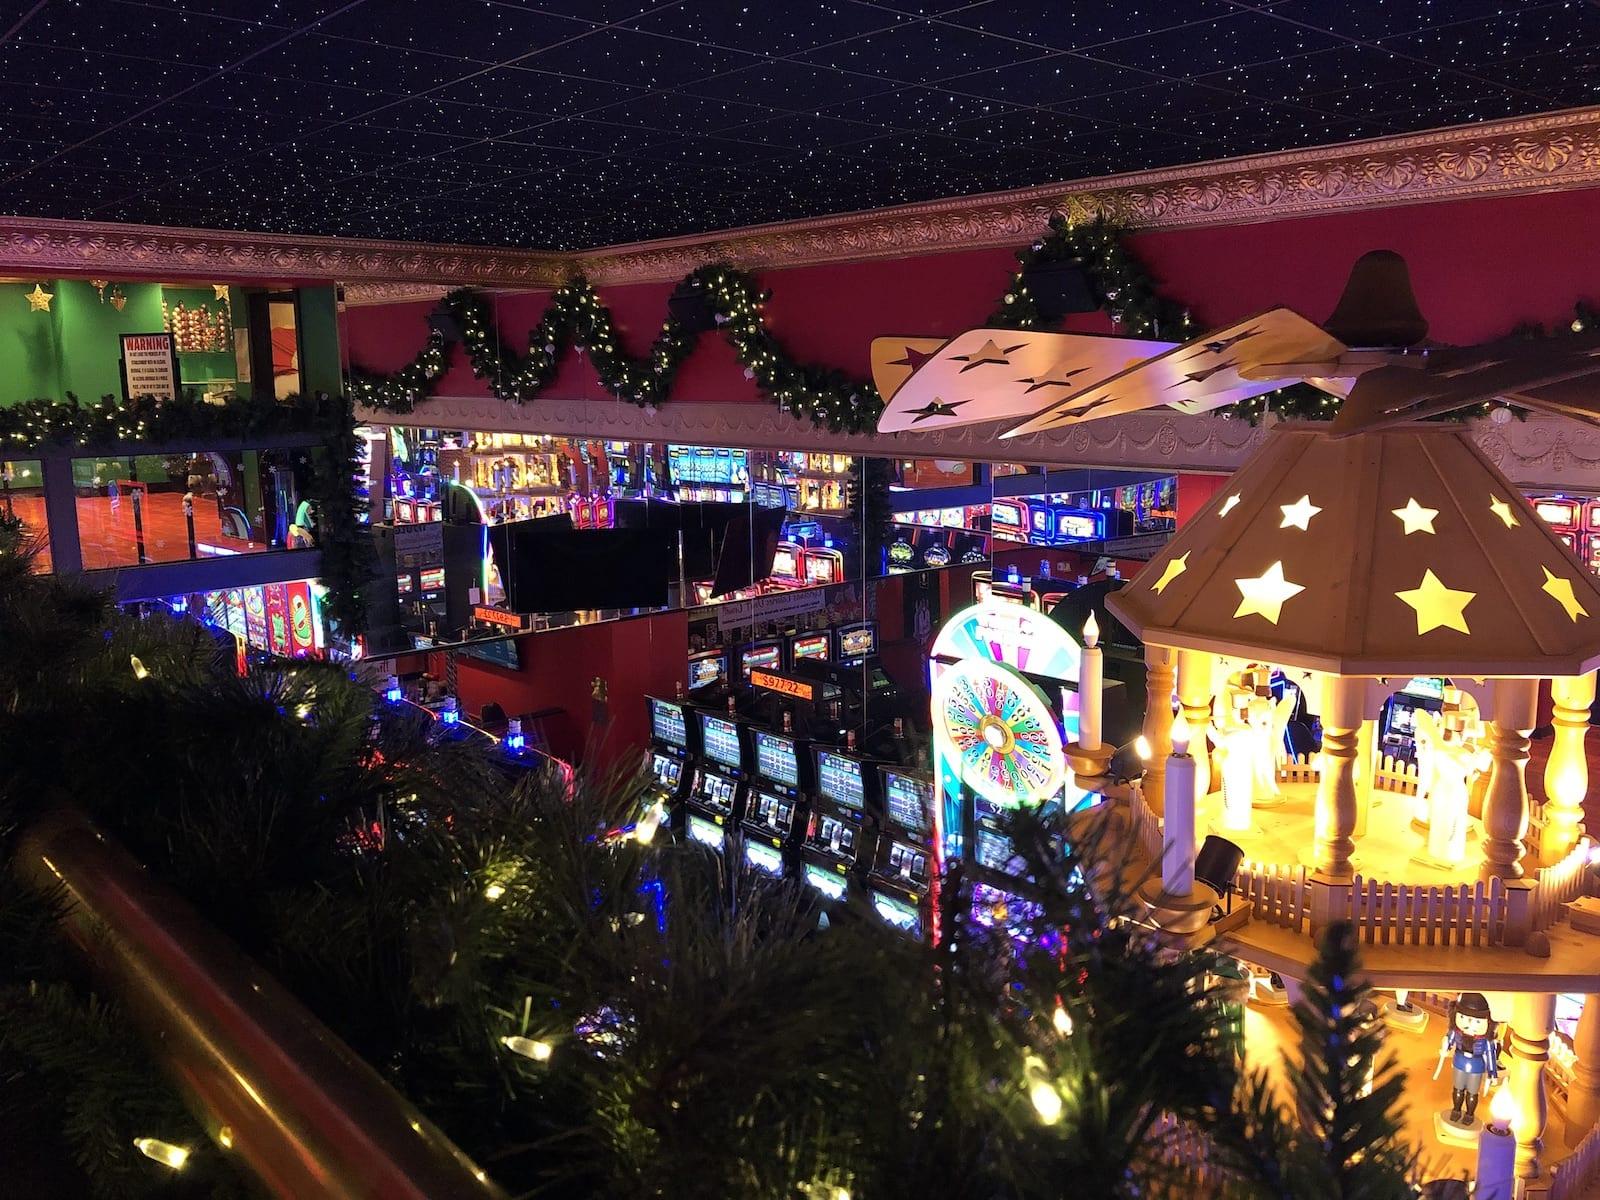 Christmas Inn Casino Slots and Holiday Lights Cripple Creek